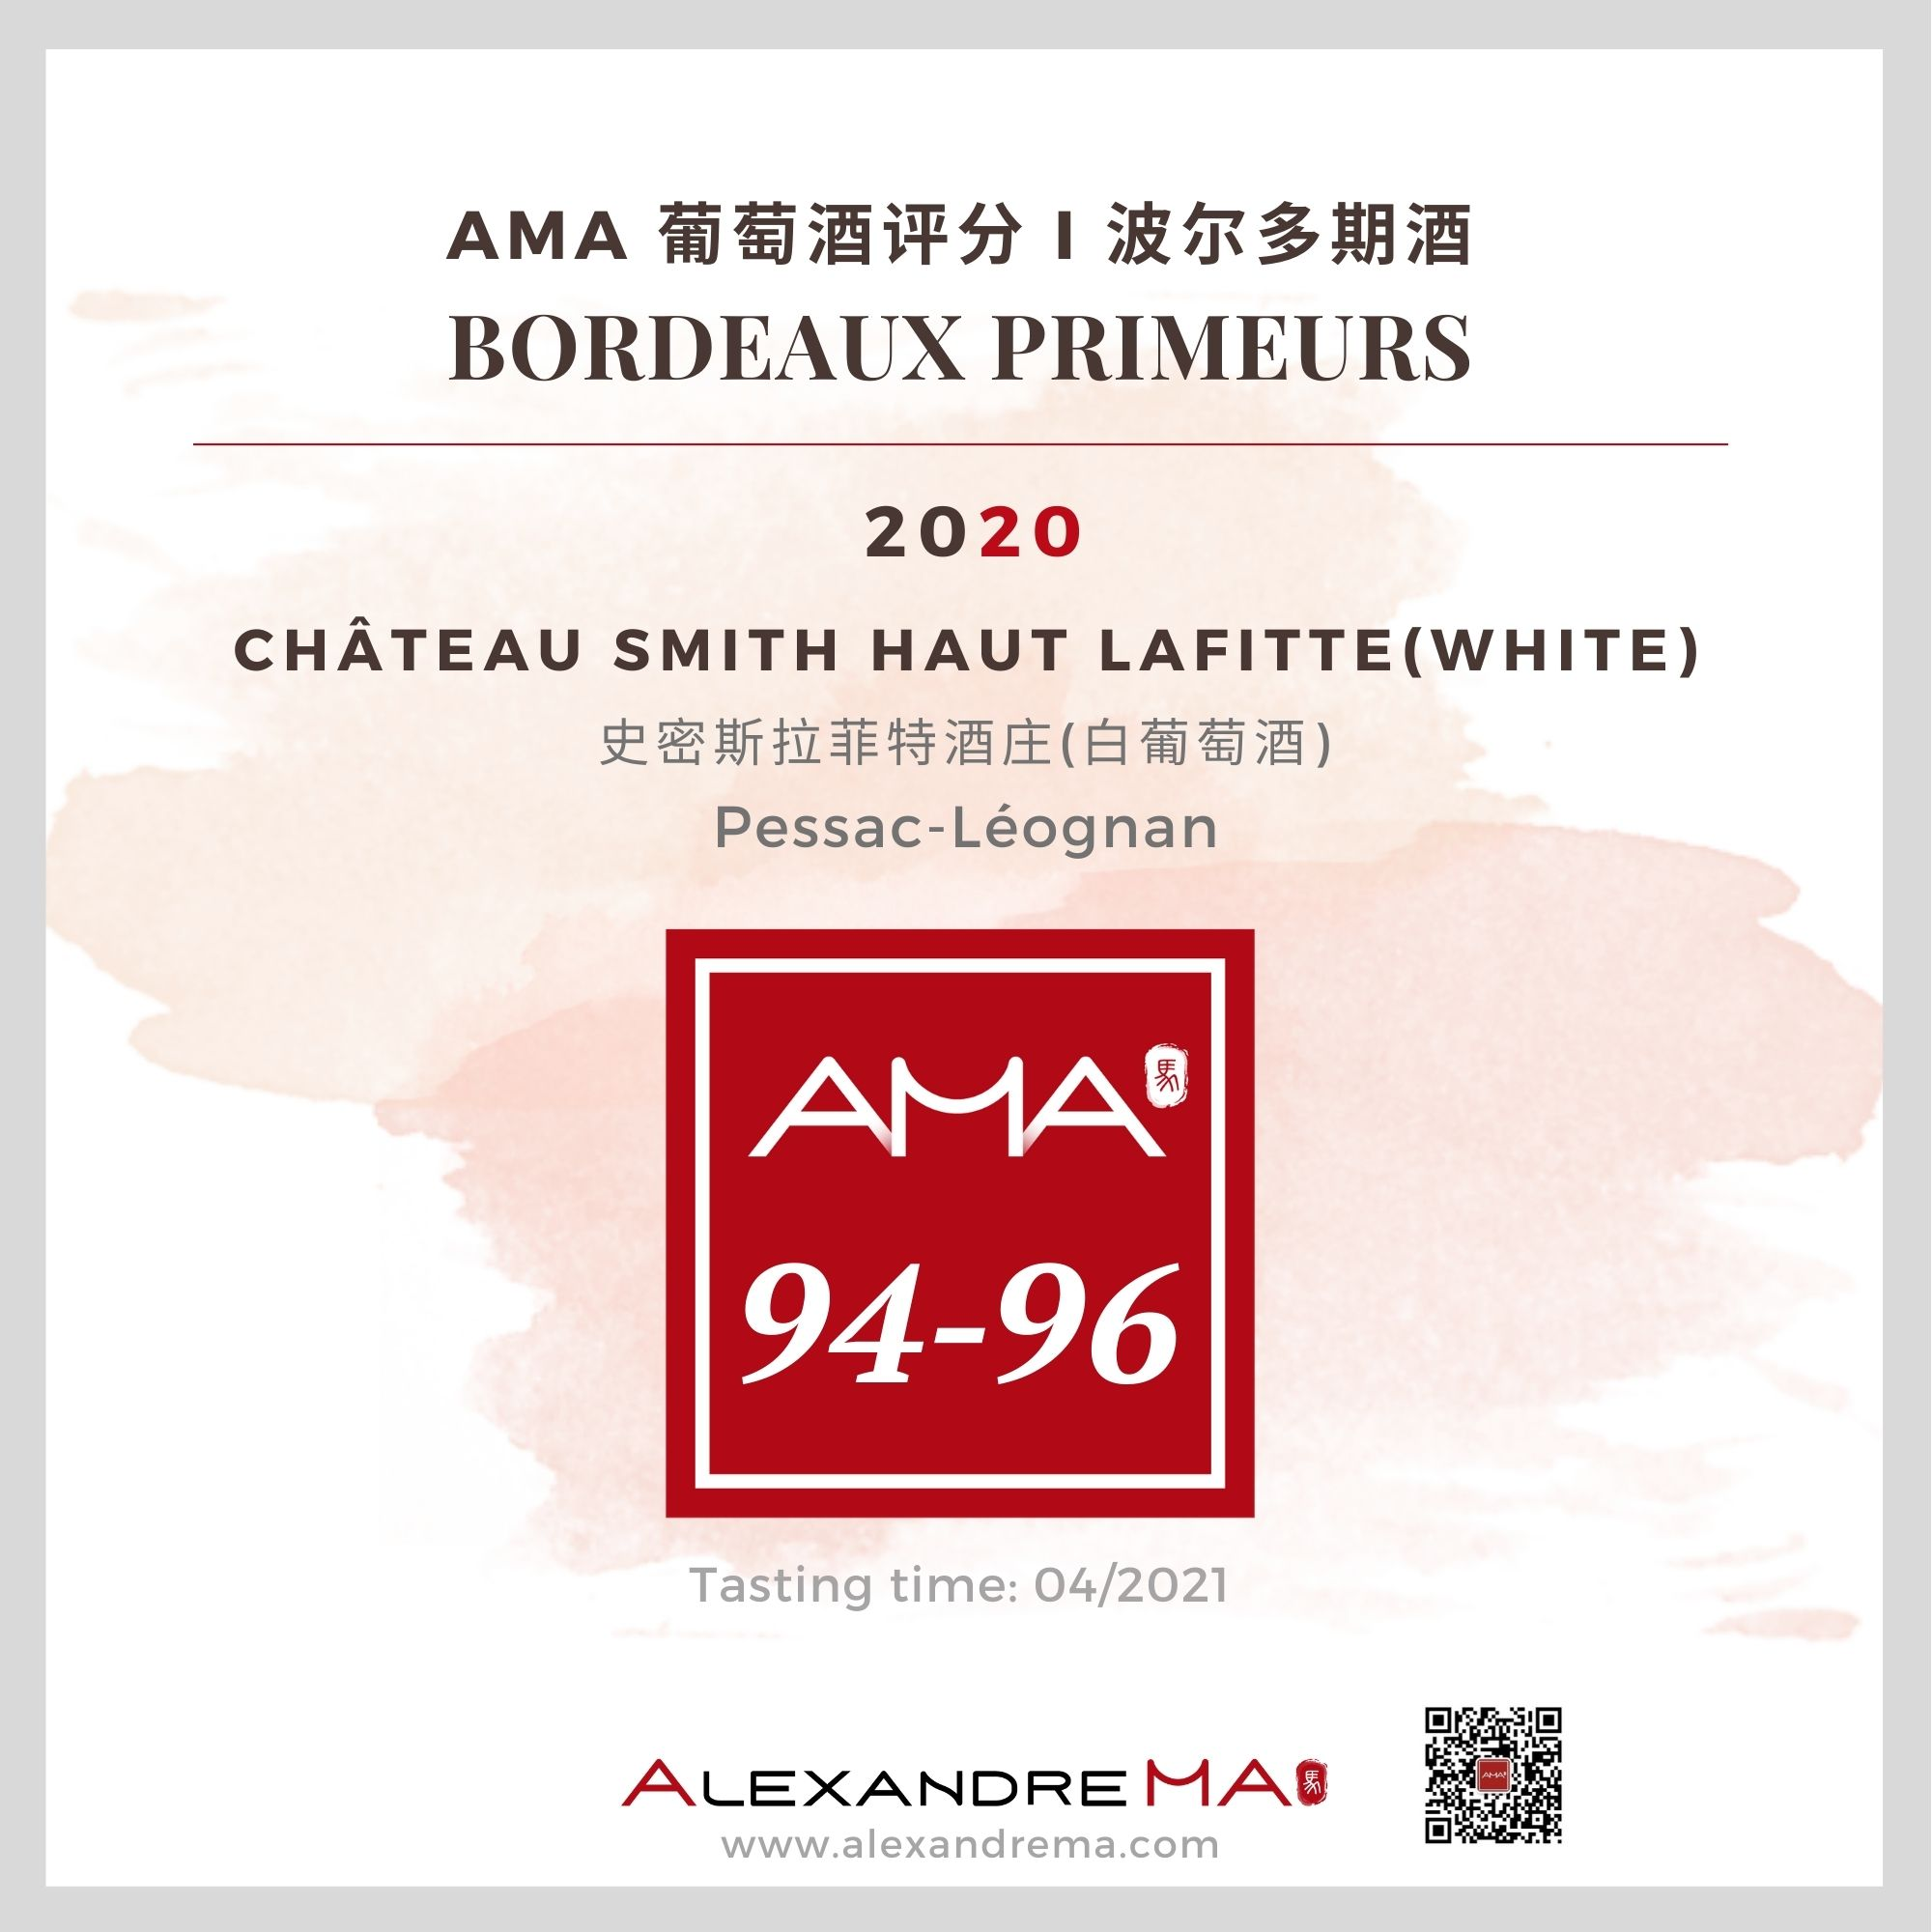 Château Smith Haut Lafitte White 2020 - Alexandre MA